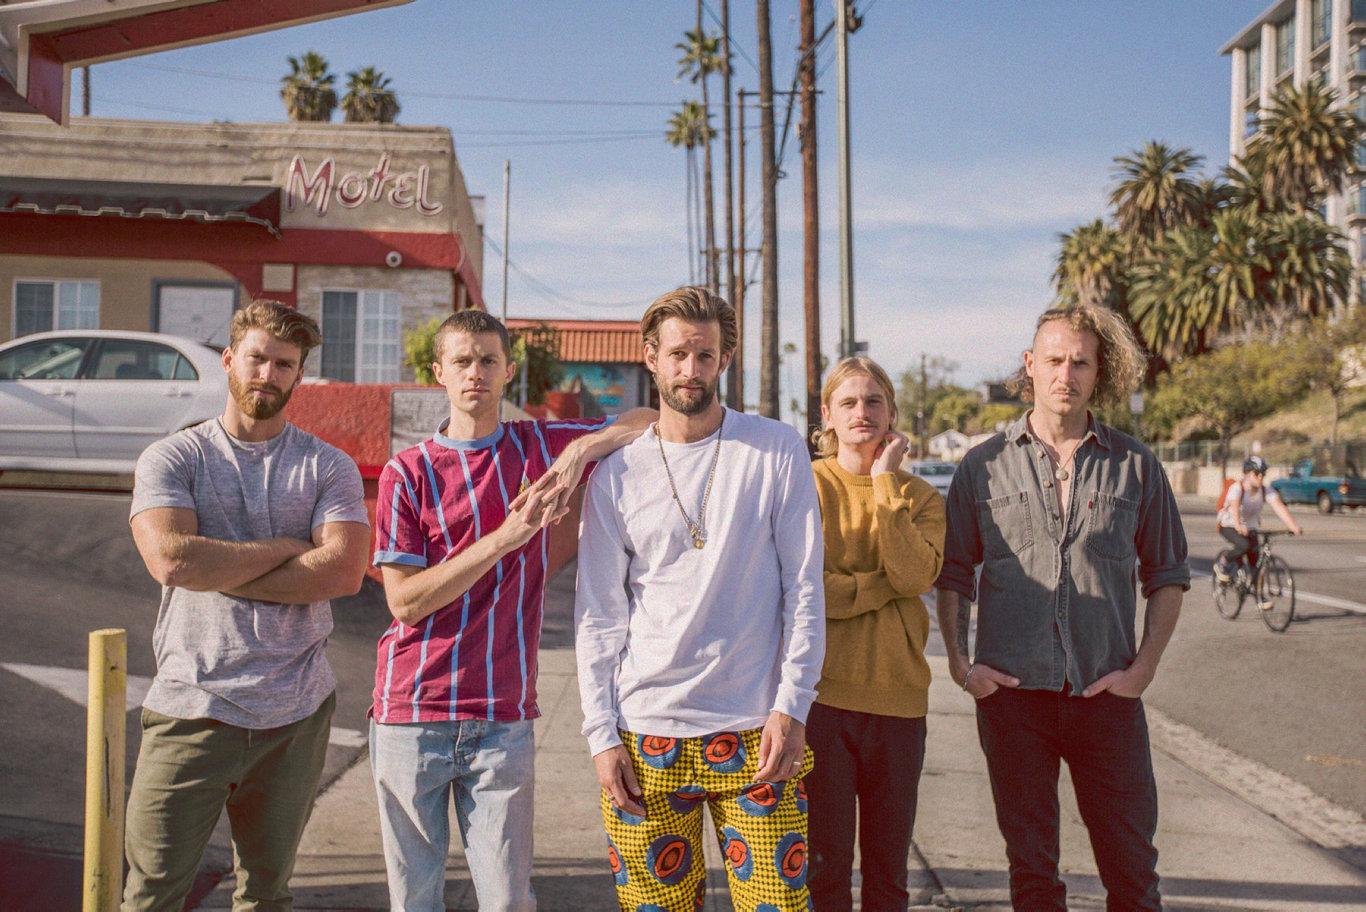 Five-piece alternative rock band The Rubens will visit Mackay during their Australian tour. PICTURE: Ali Lander-Shindler